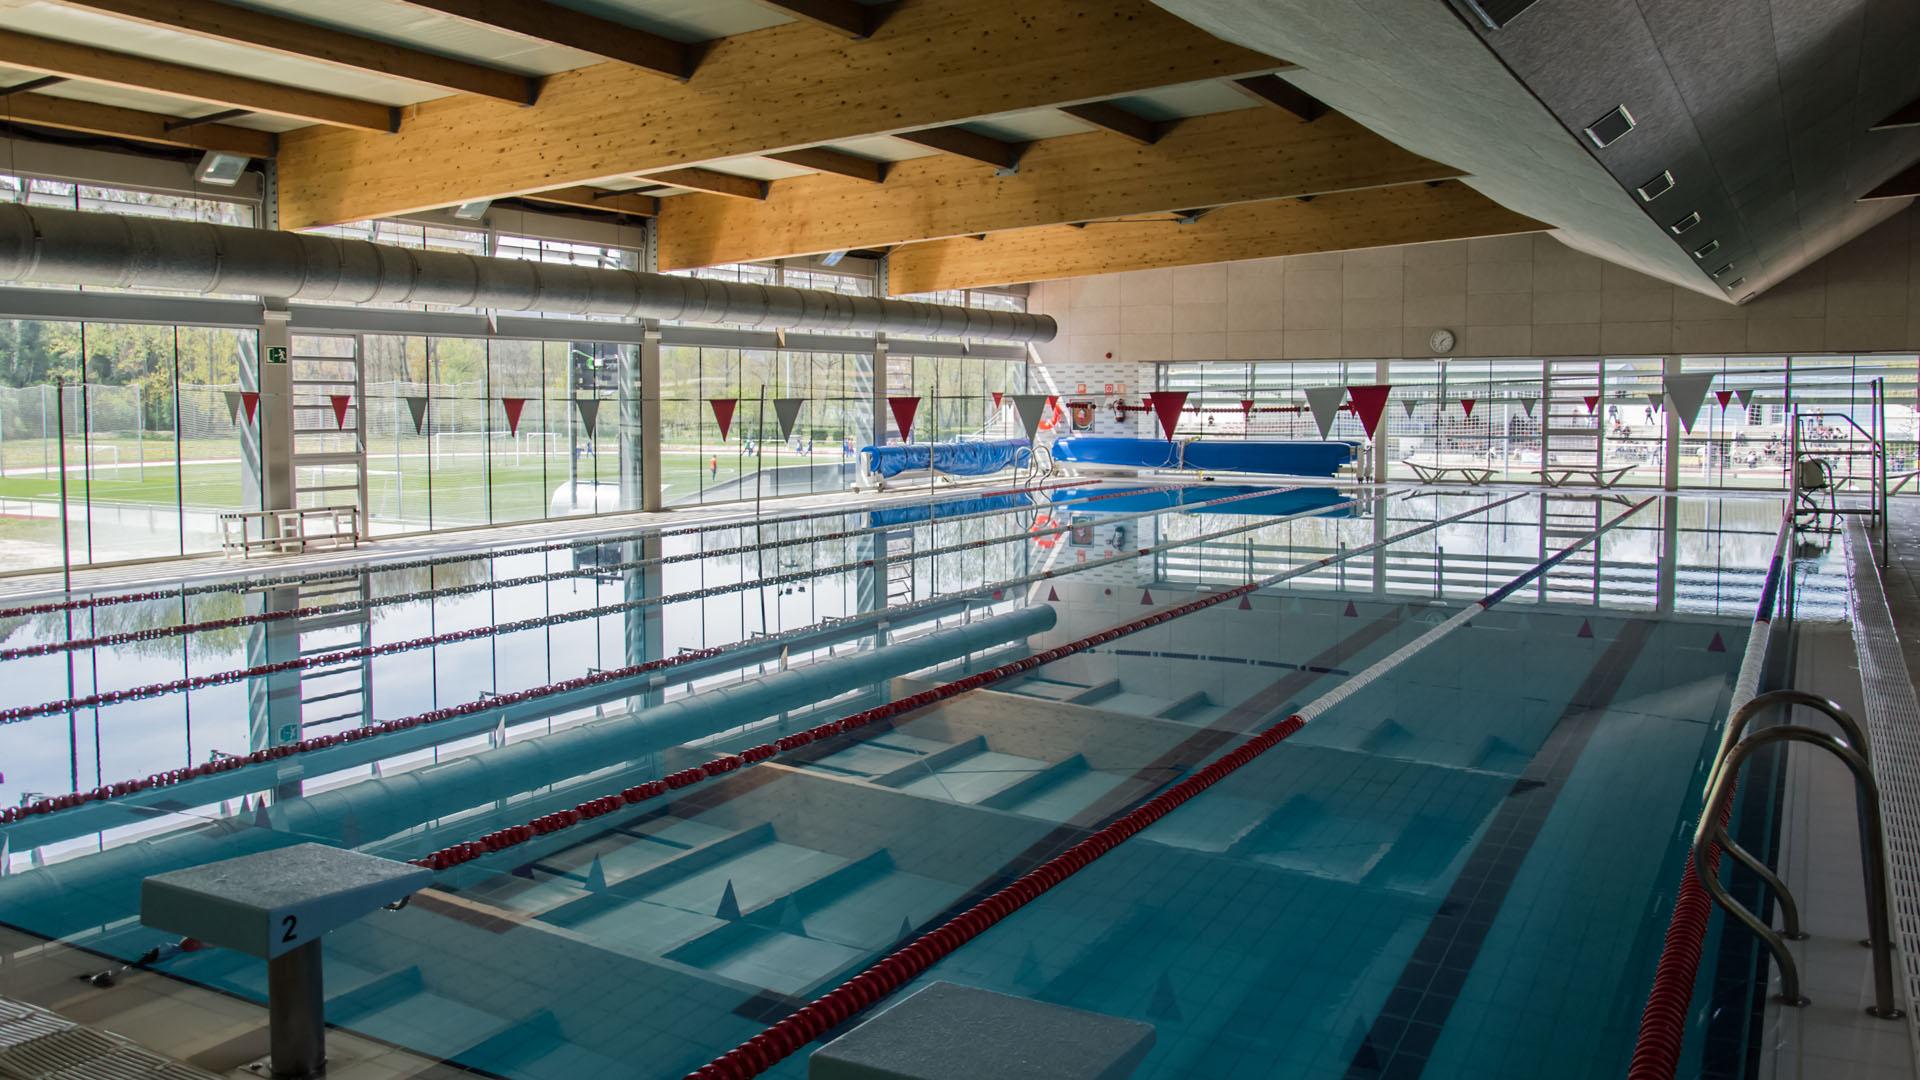 oferta gimnasio la piscina de torell torell gymforless